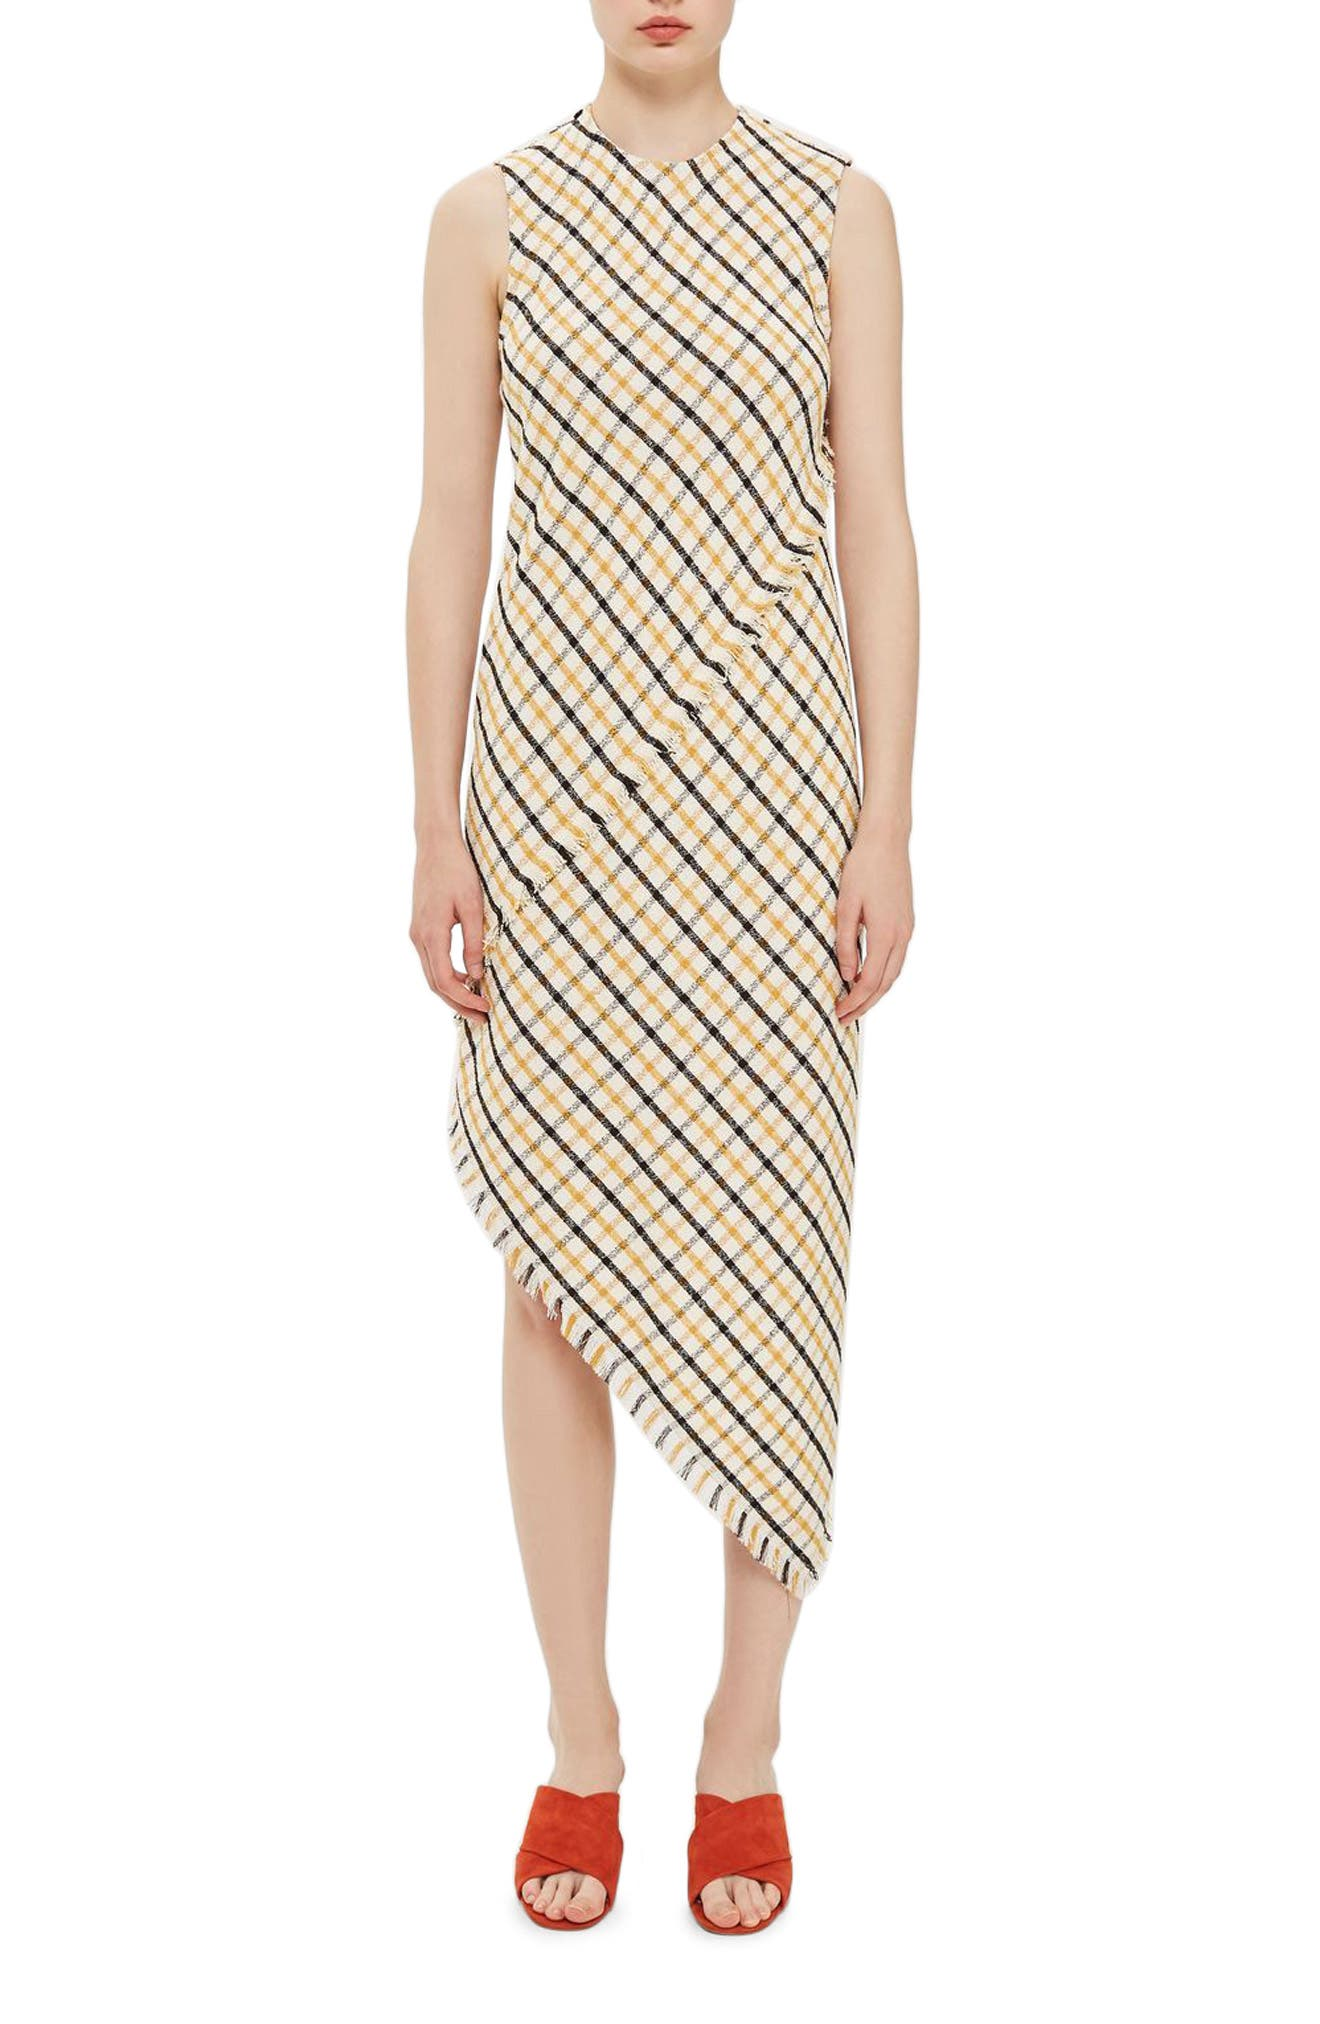 Topshop Boutique Gingham Slash Back Asymmetrical Midi Dress